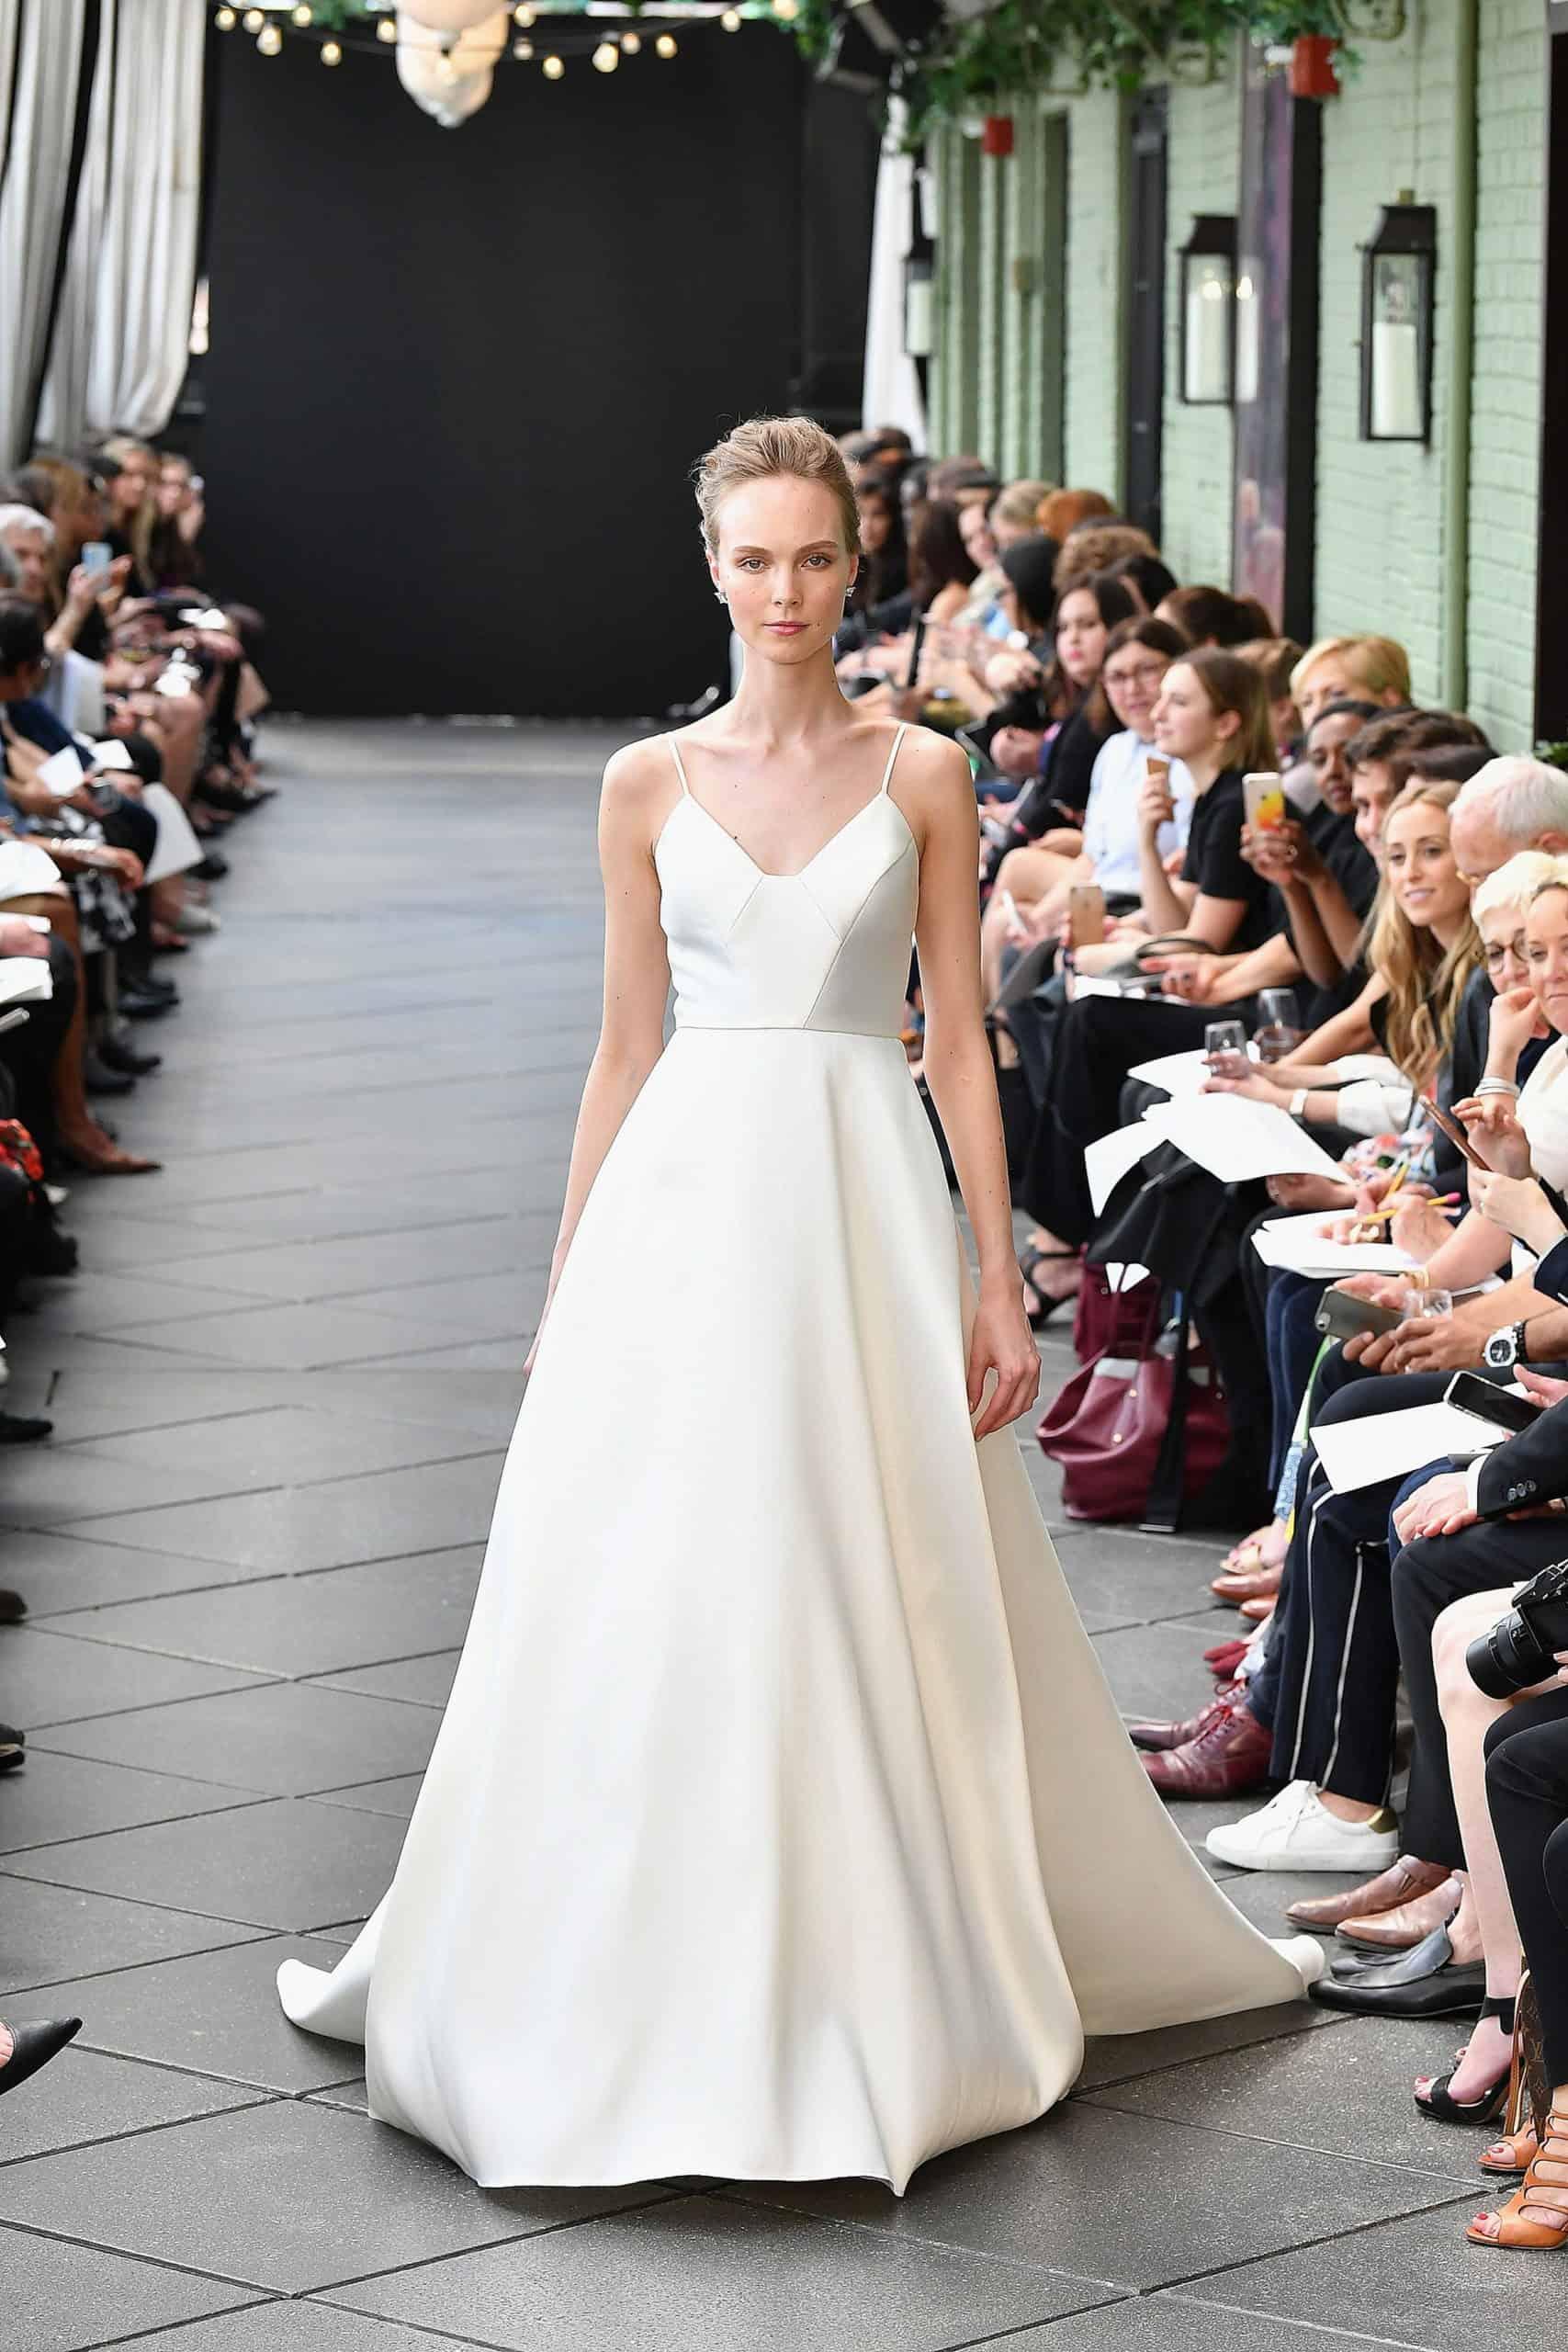 a line wedding dress by Amsale